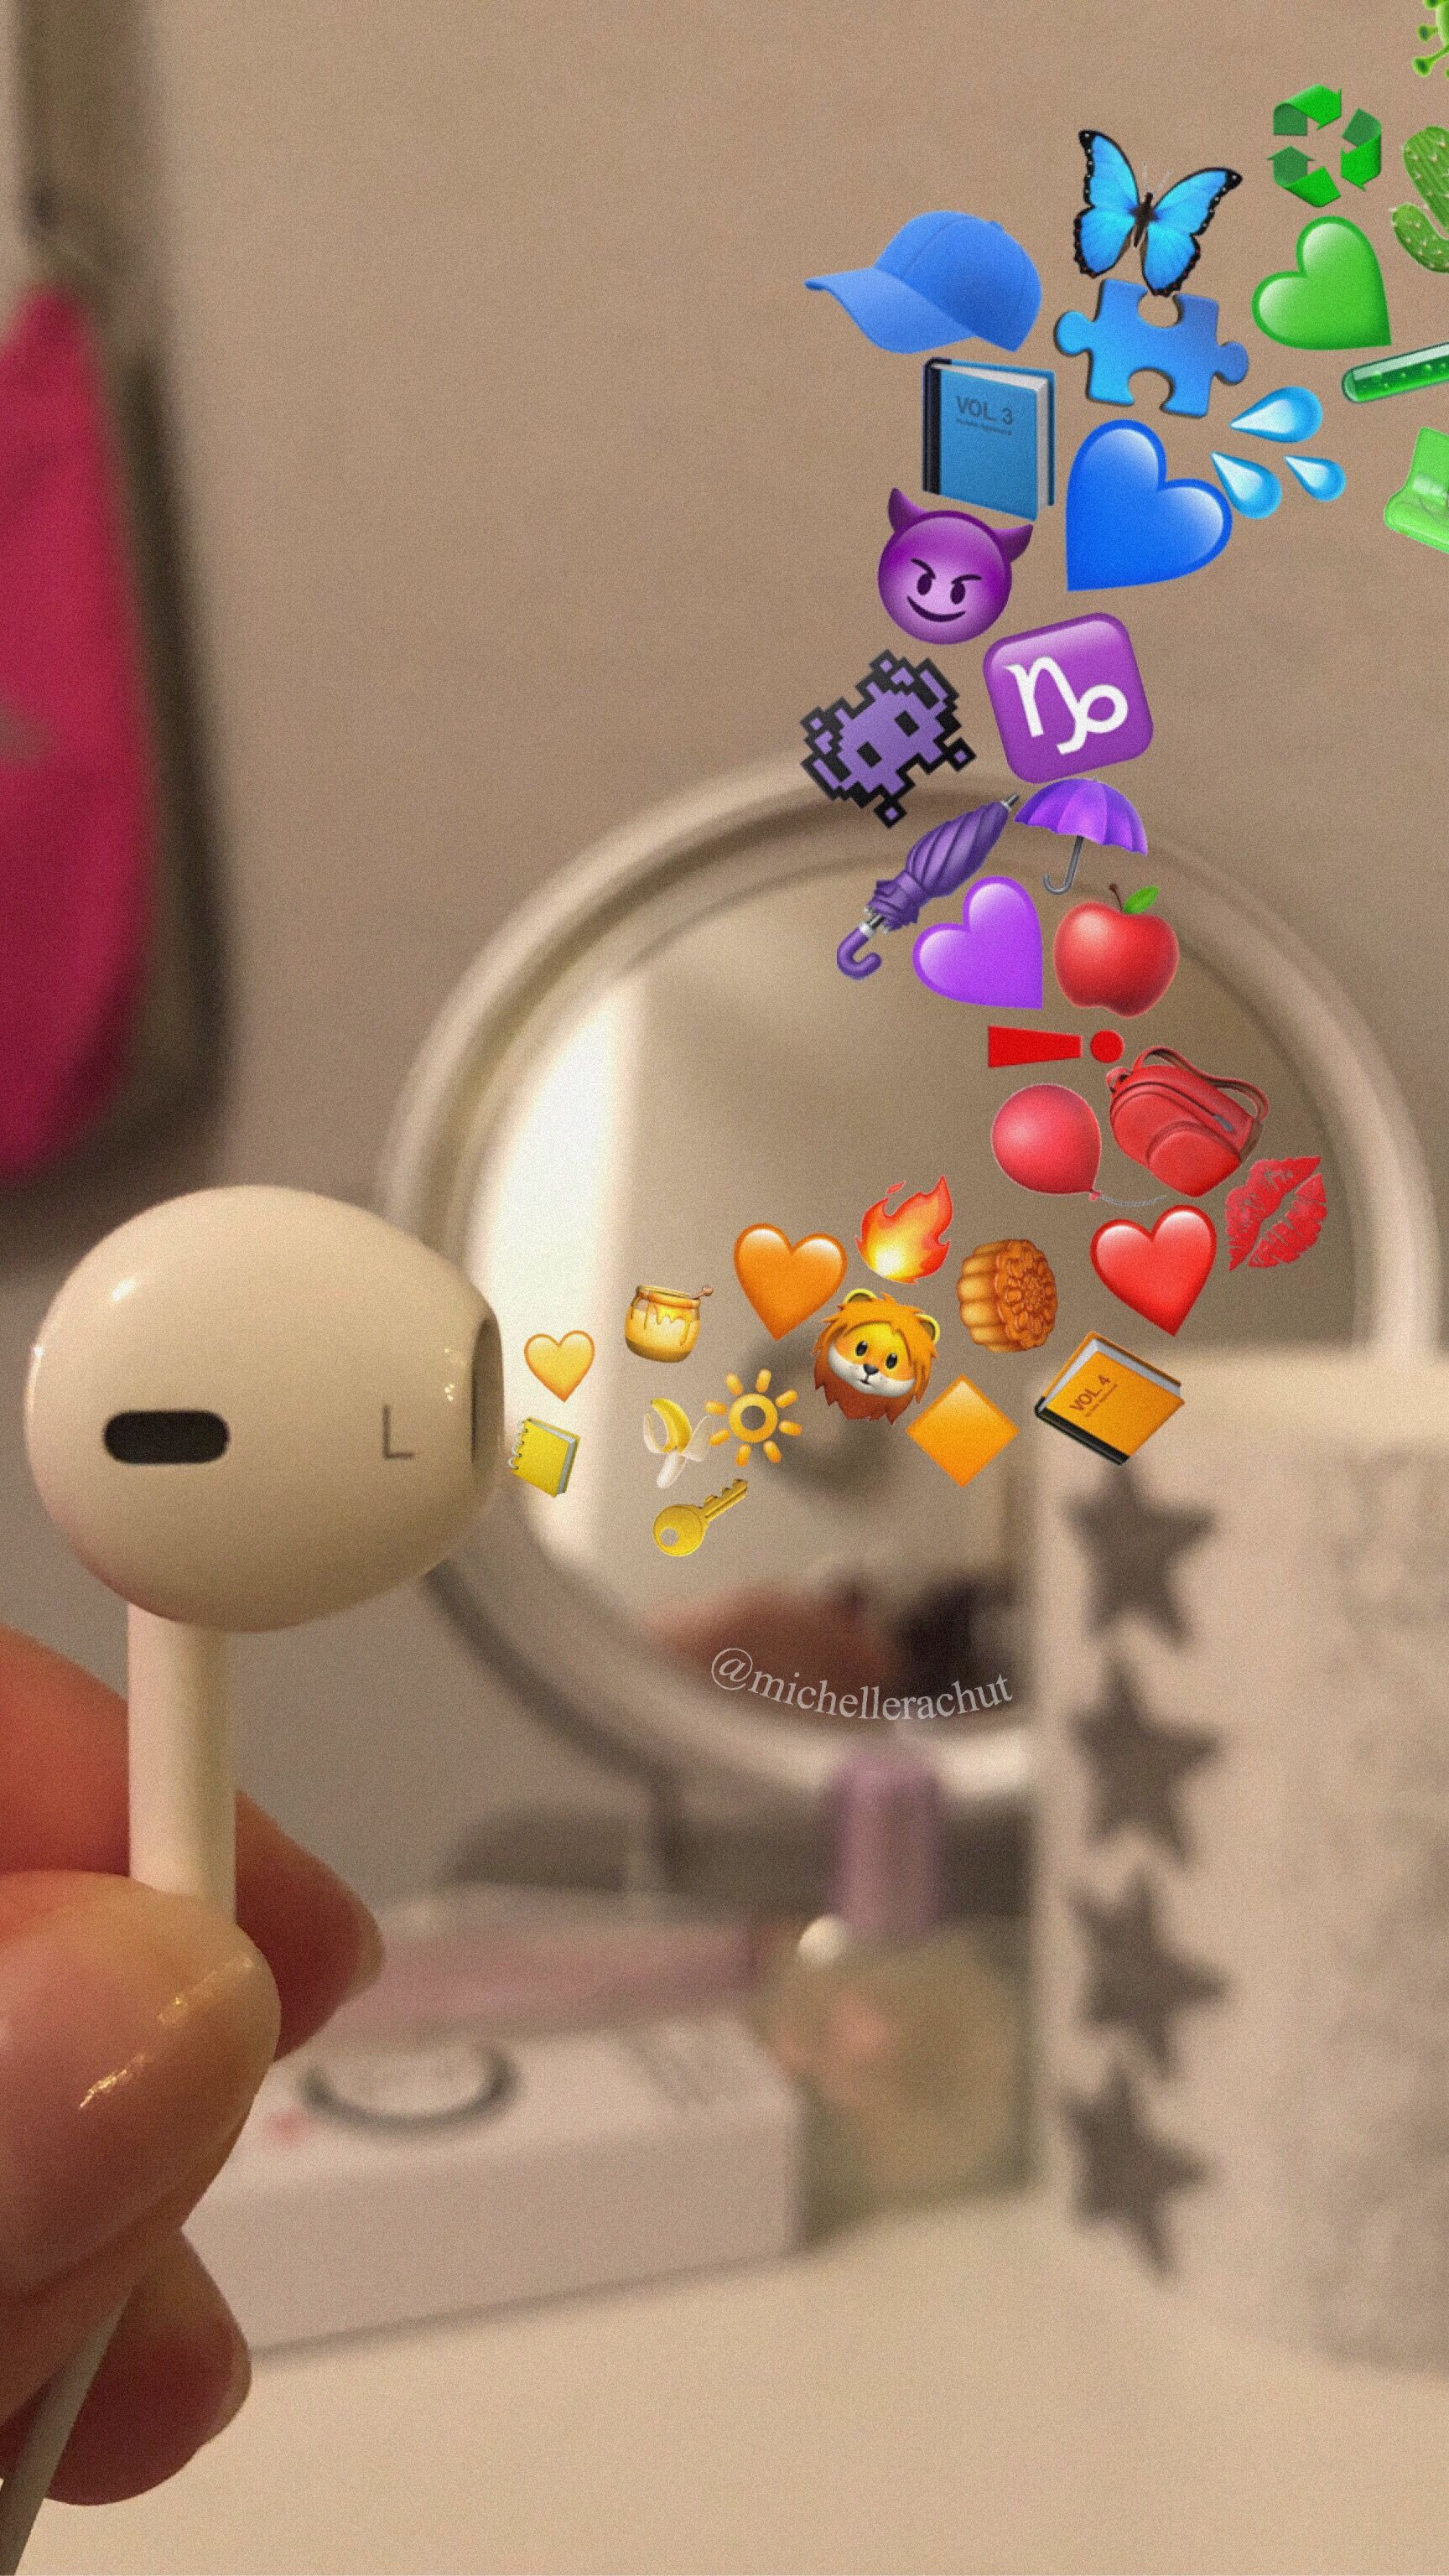 Emoji Headphones Iphone Headphones Tumblr Headphones By Michellerachut Fond D Ecran Telephone Fond D Ecran Emoji Iphone Idees Snapchat